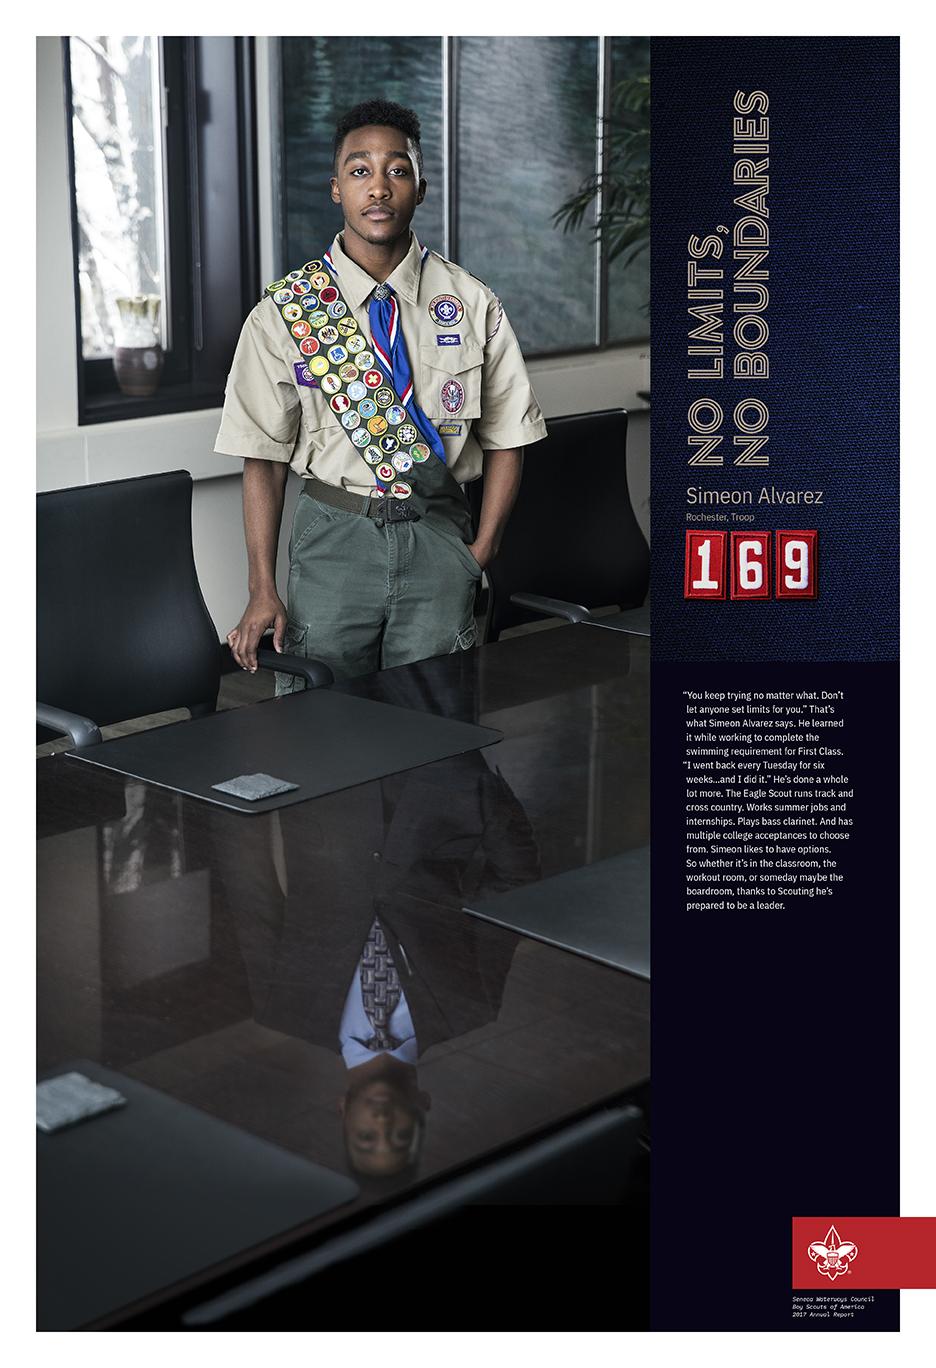 PBNO-1802 Boy Scout 2017 Posters 13x19_Part3.jpg